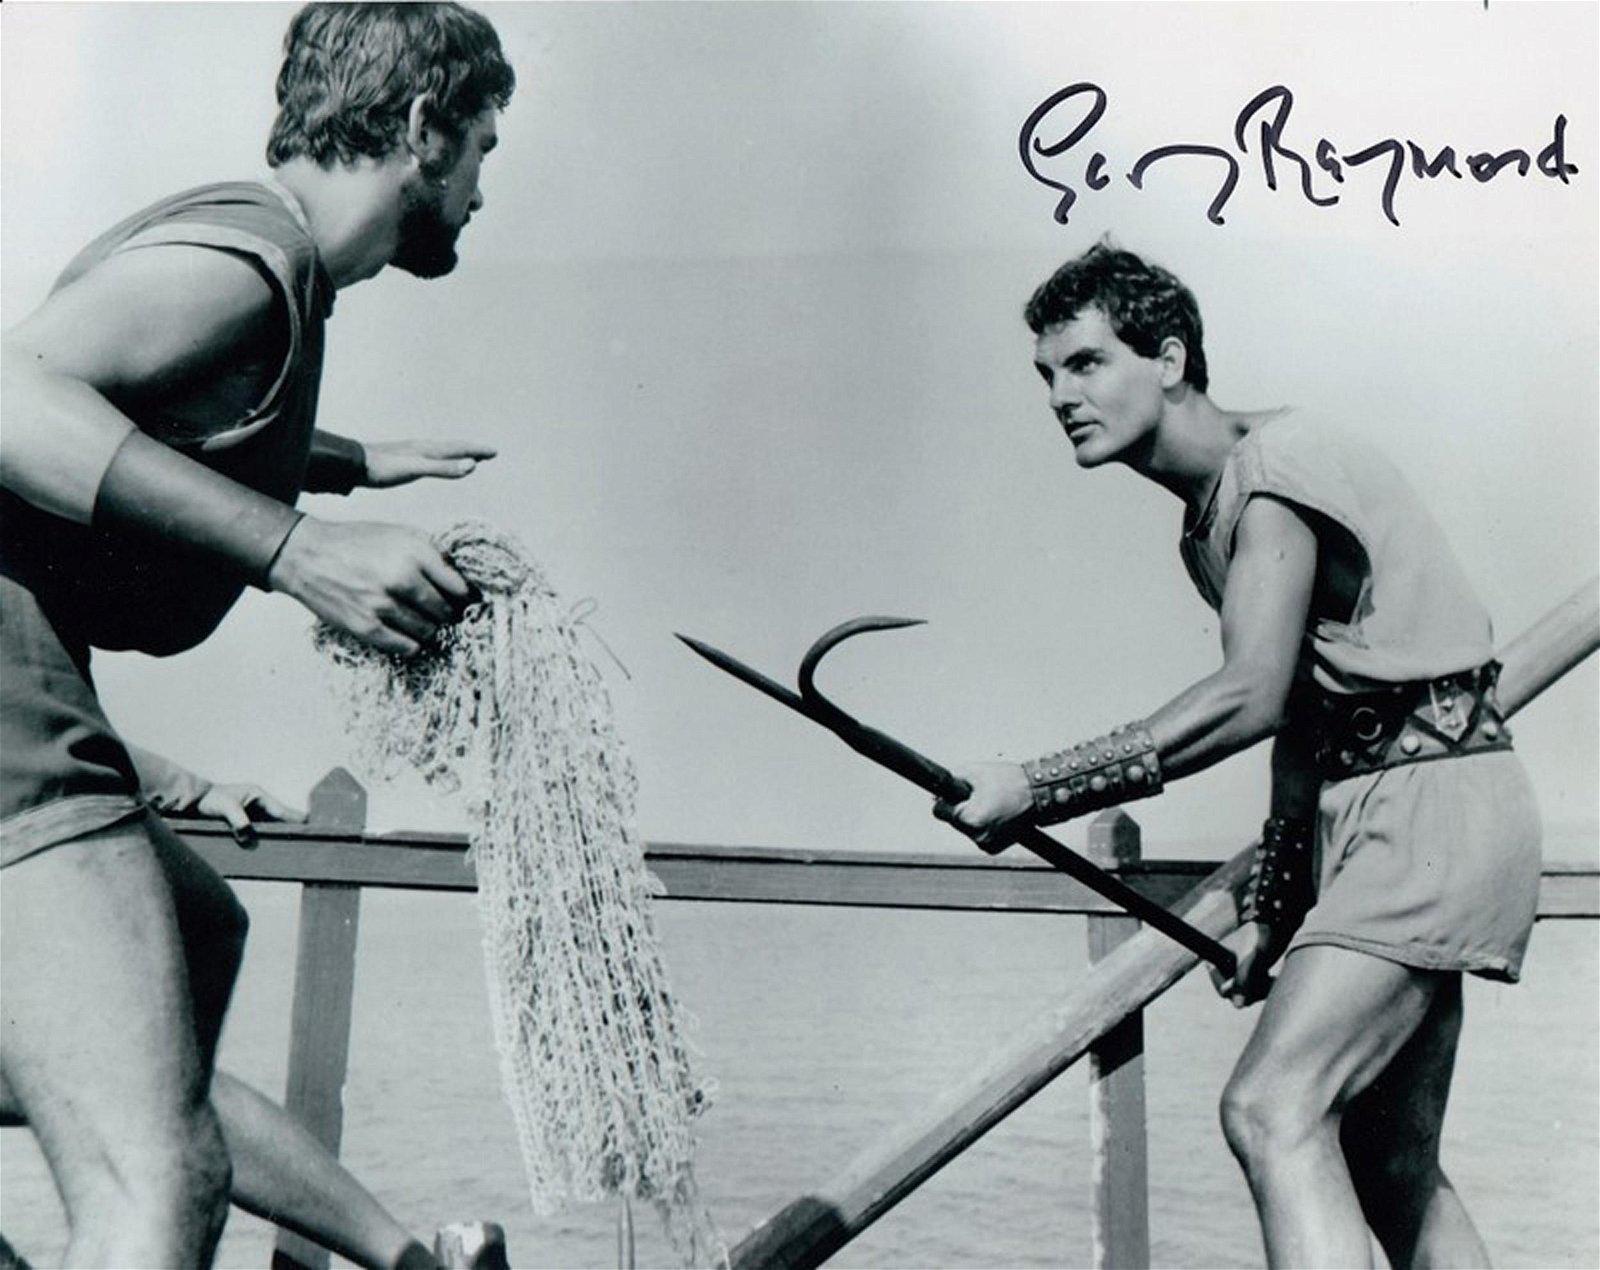 Blowout Sale! Jason and the Argonauts hand signed 10x8